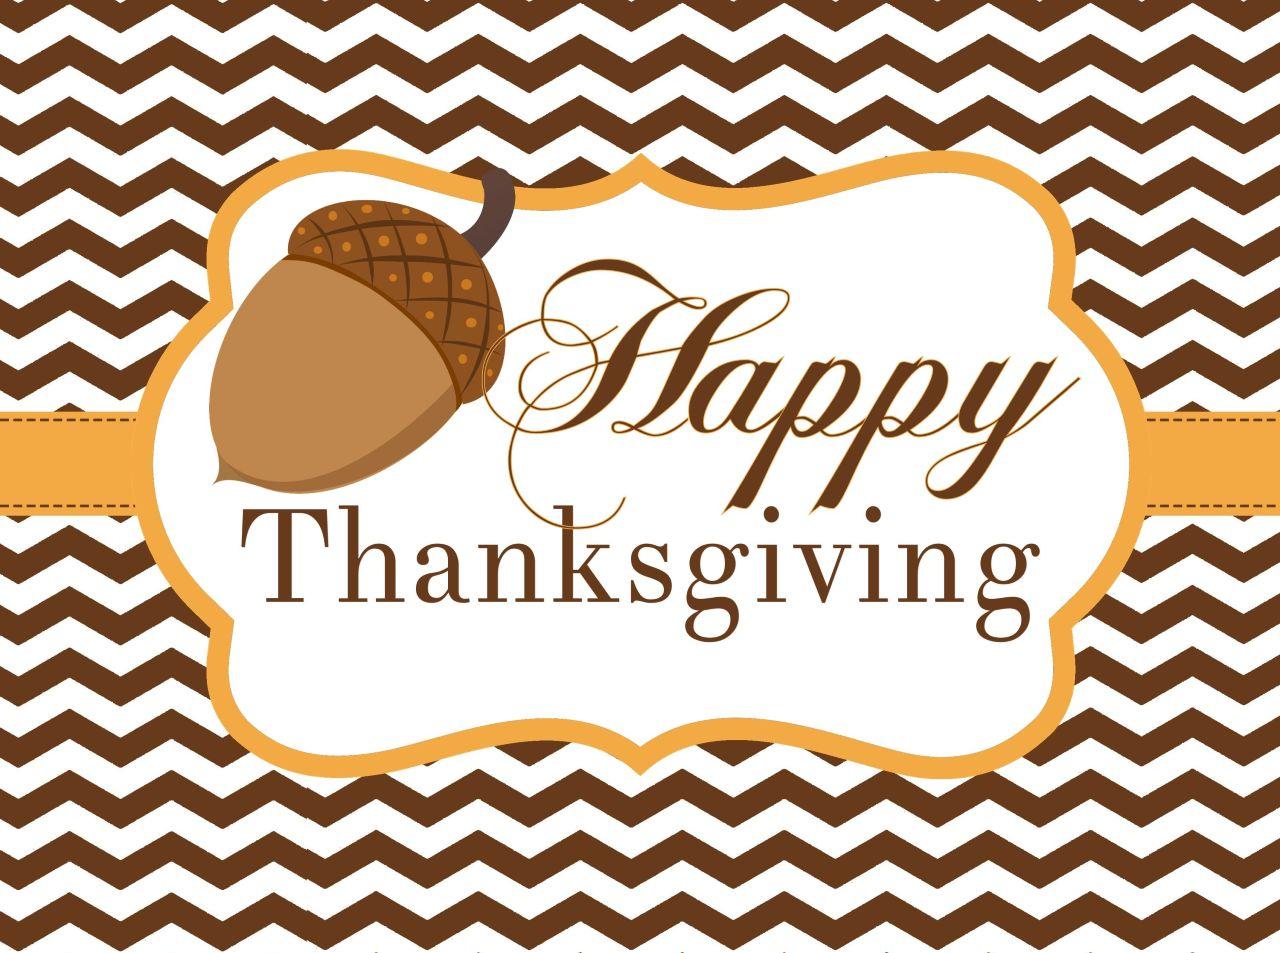 Happy-Thanksgiving-Wallpaper-HD